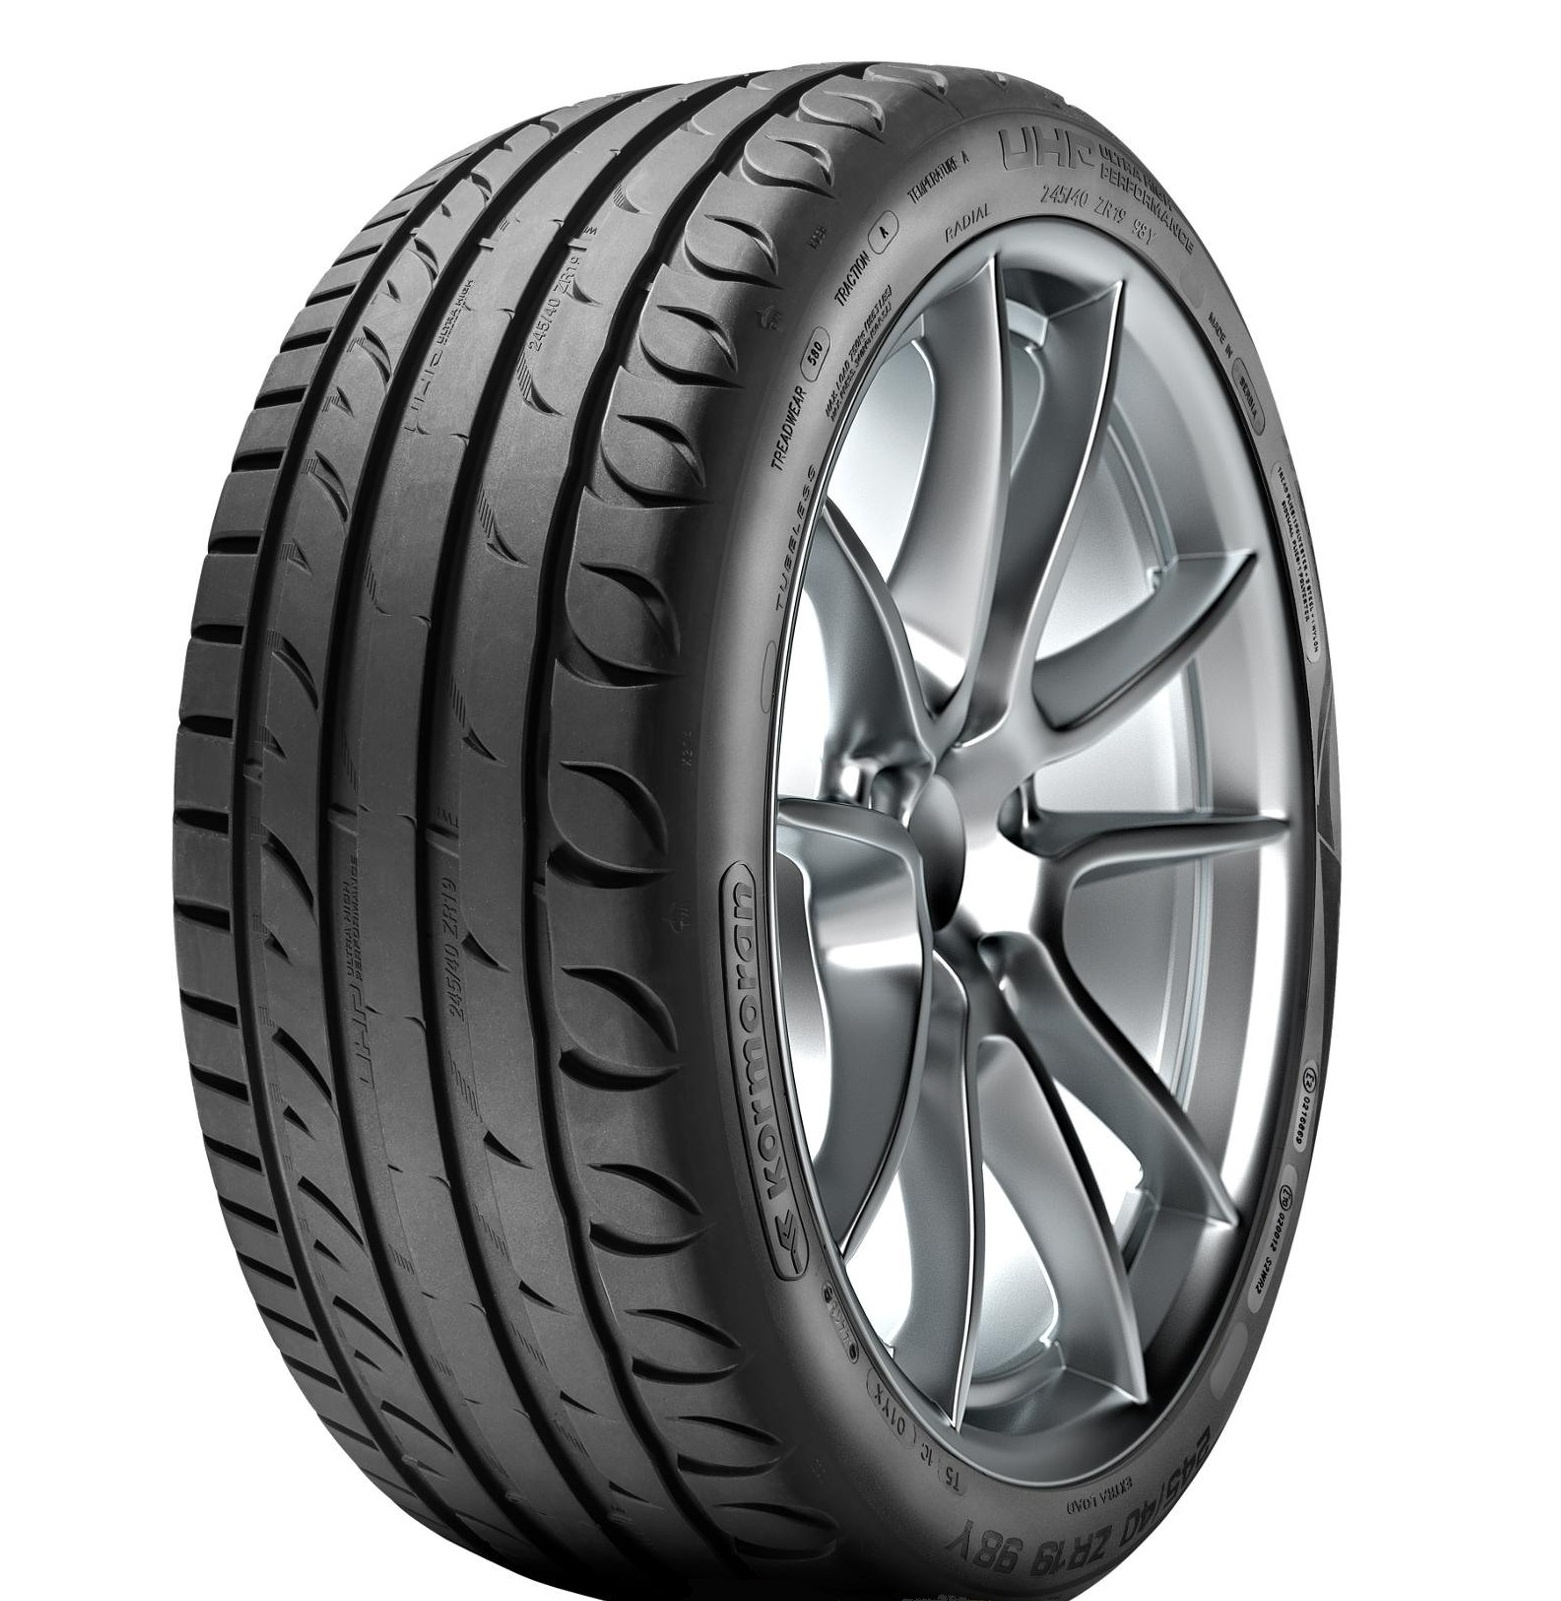 Шины для легковых автомобилей Шины автомобильные летние шина kormoran ultra high performance 225 50 zr17 98w xl